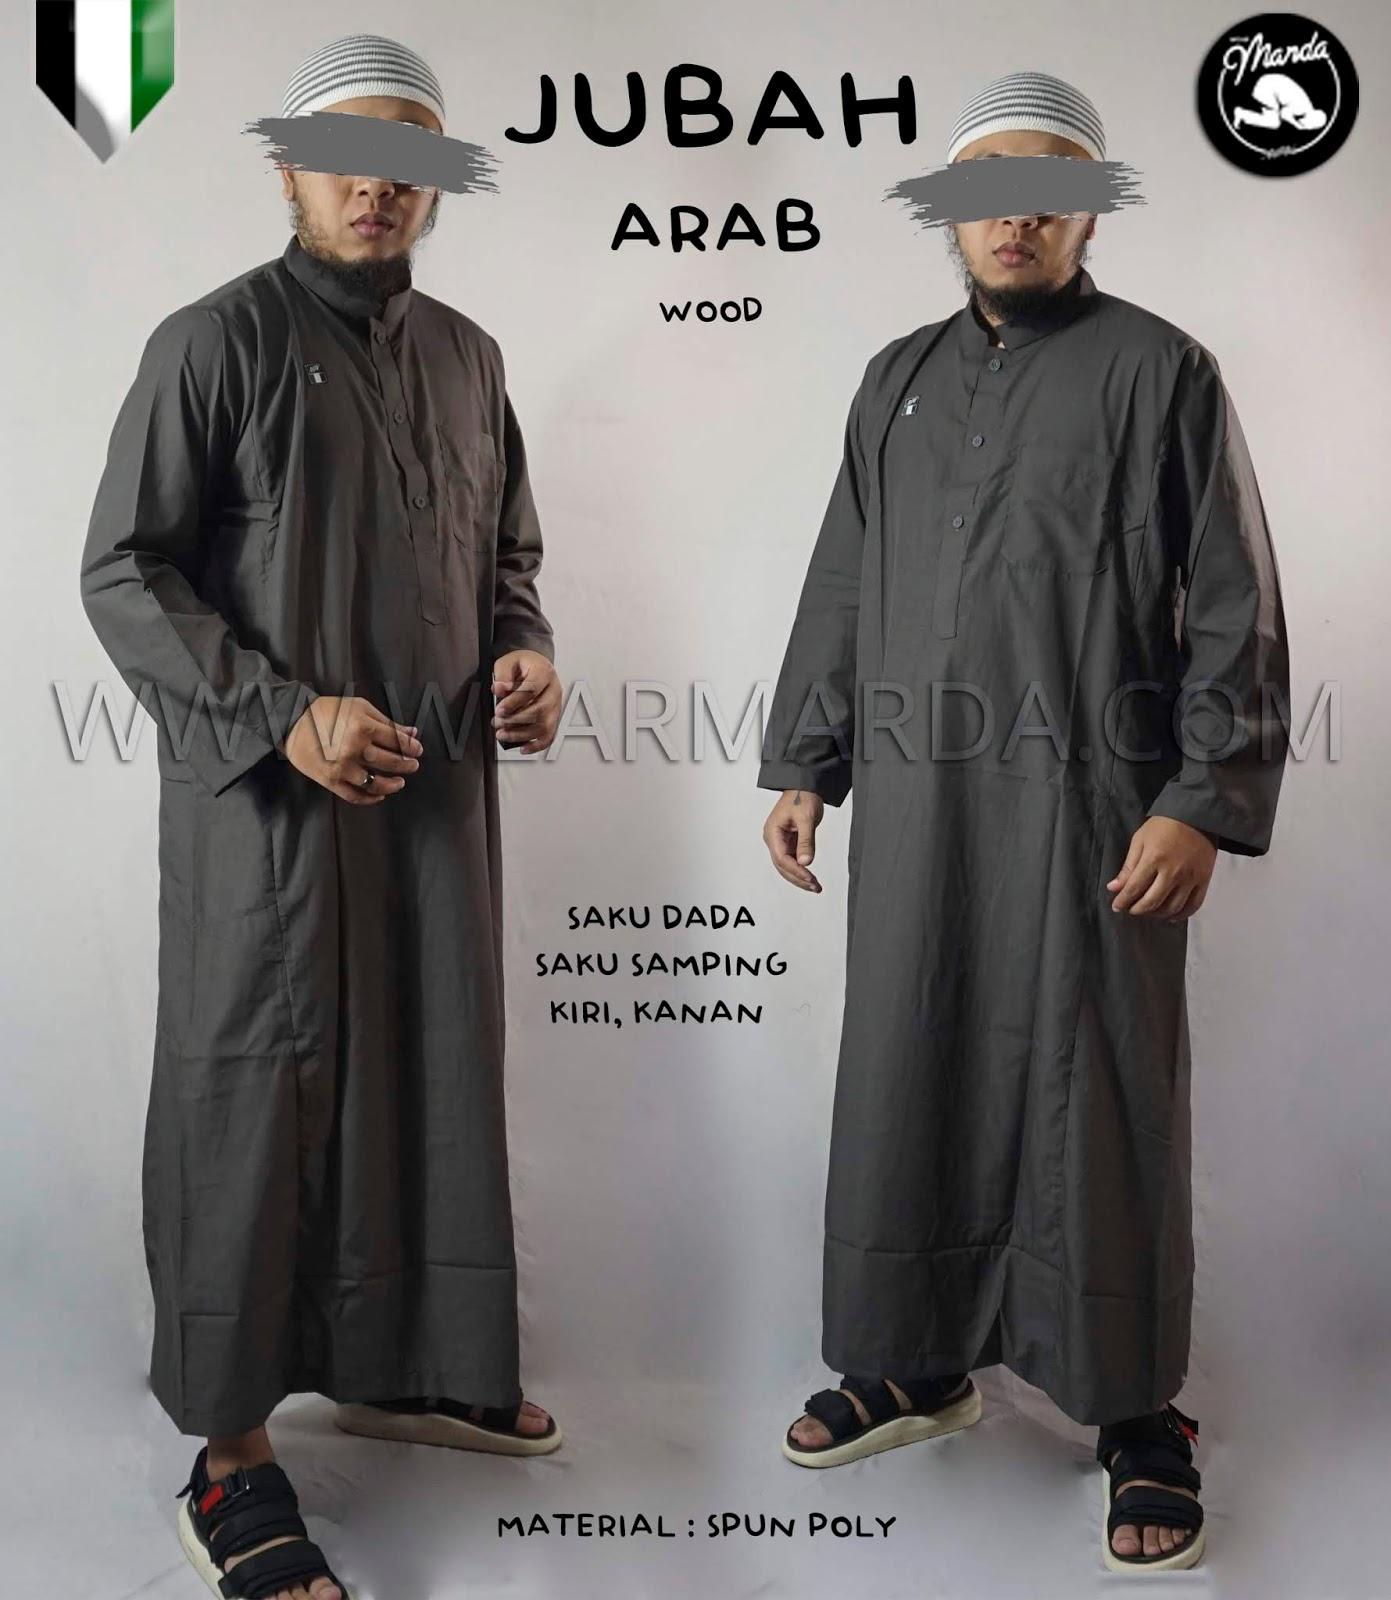 JUBAH ARAB WOOD